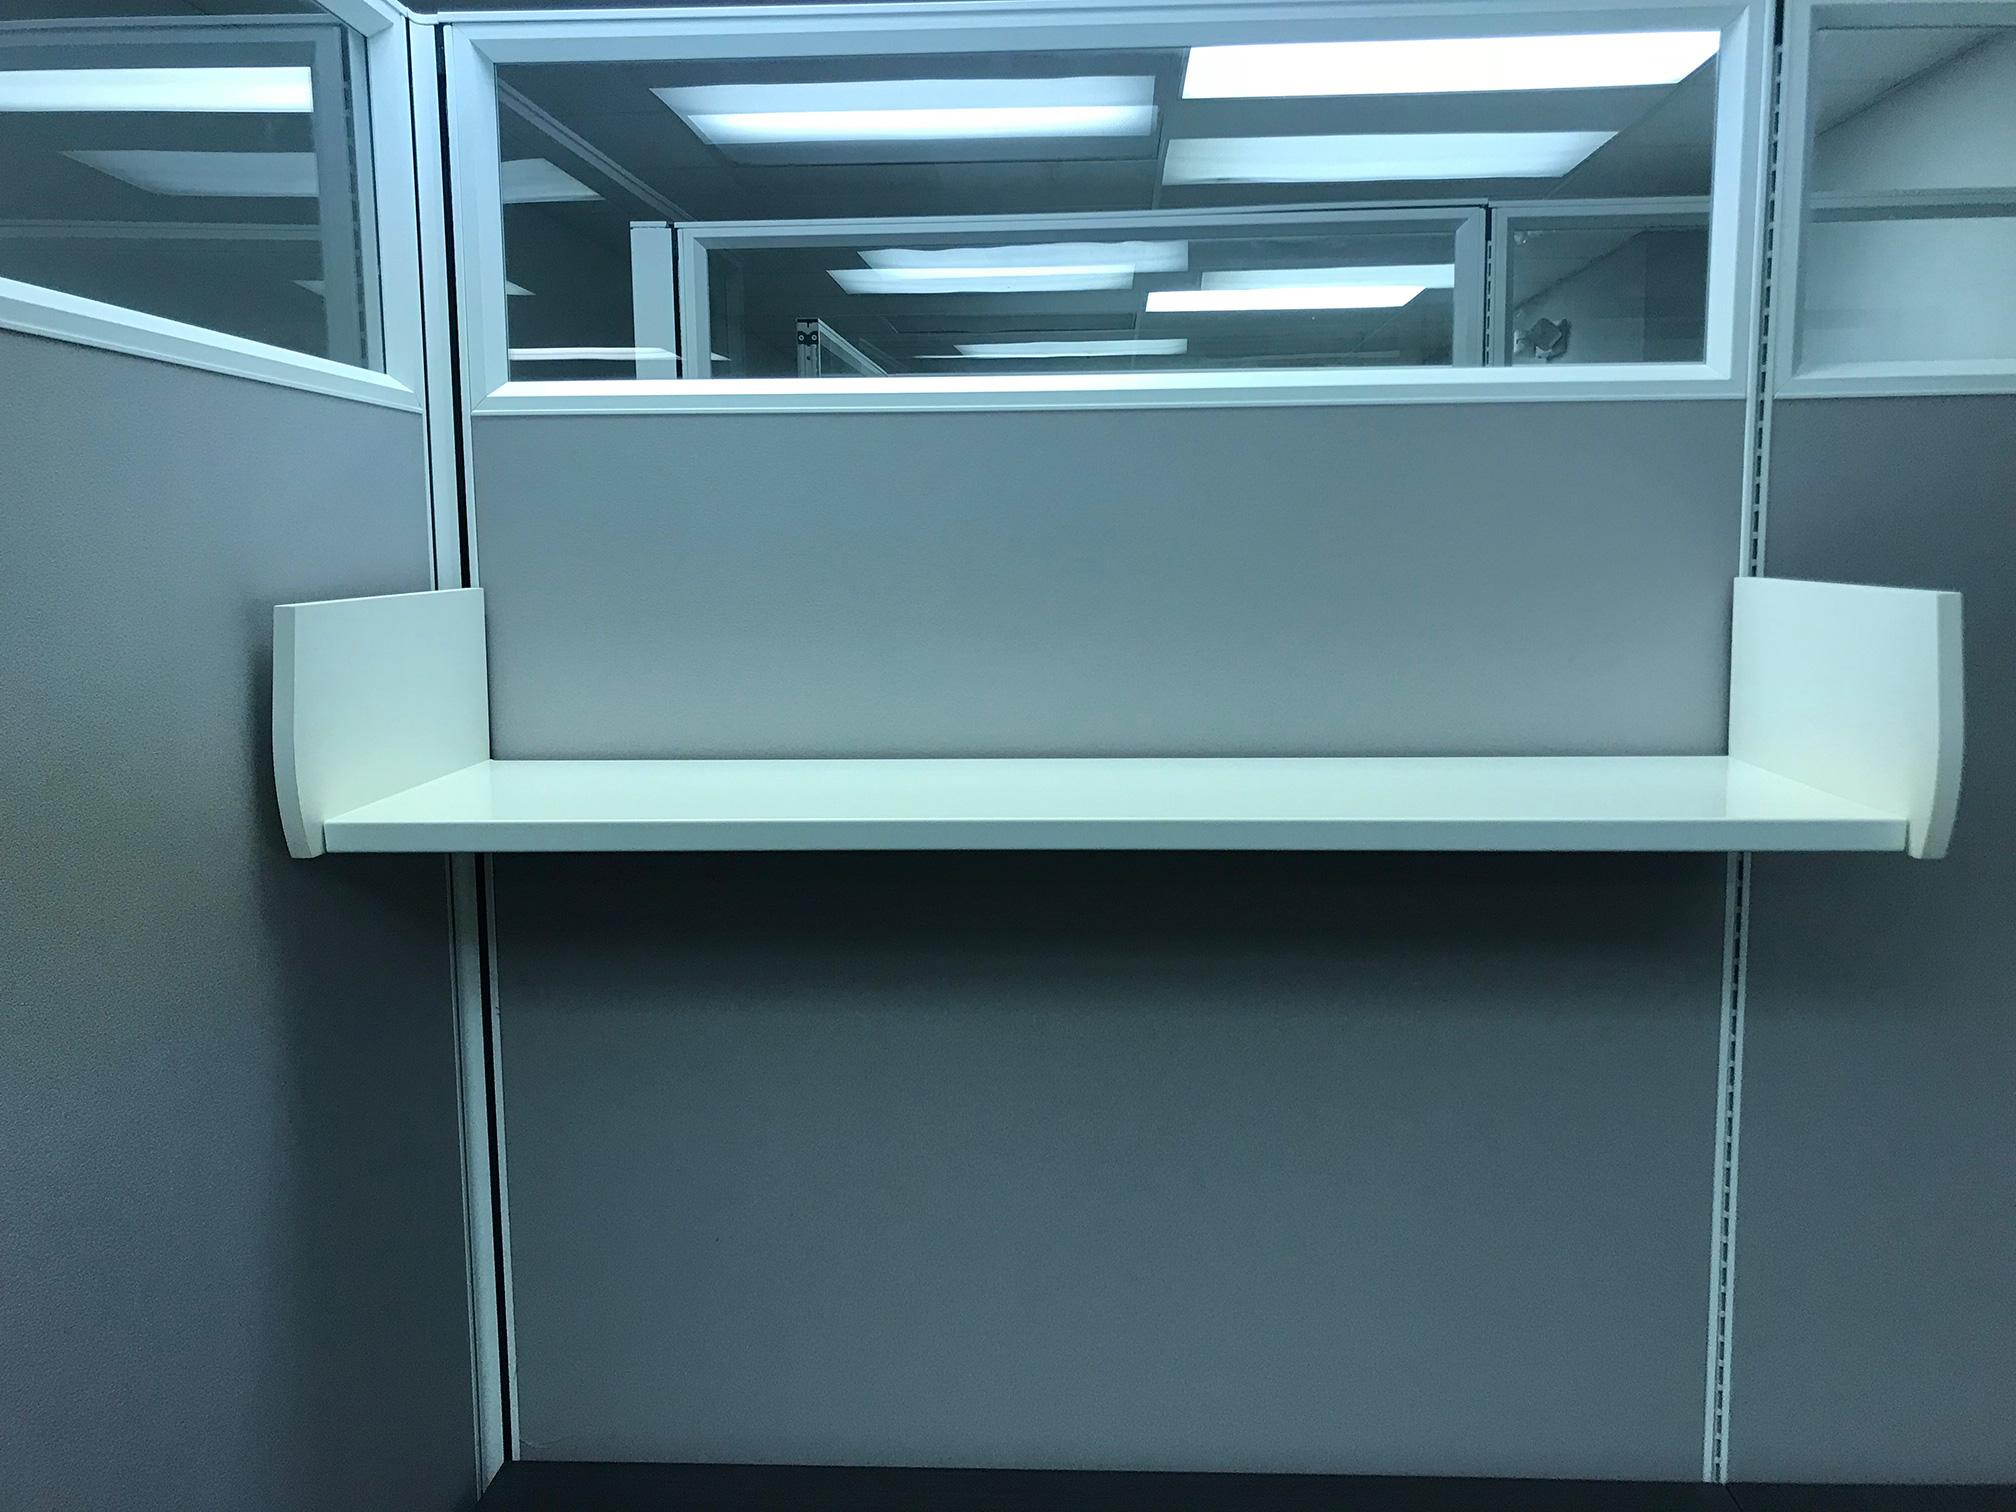 manasota-office-supplies-llc-img-7683.jpg